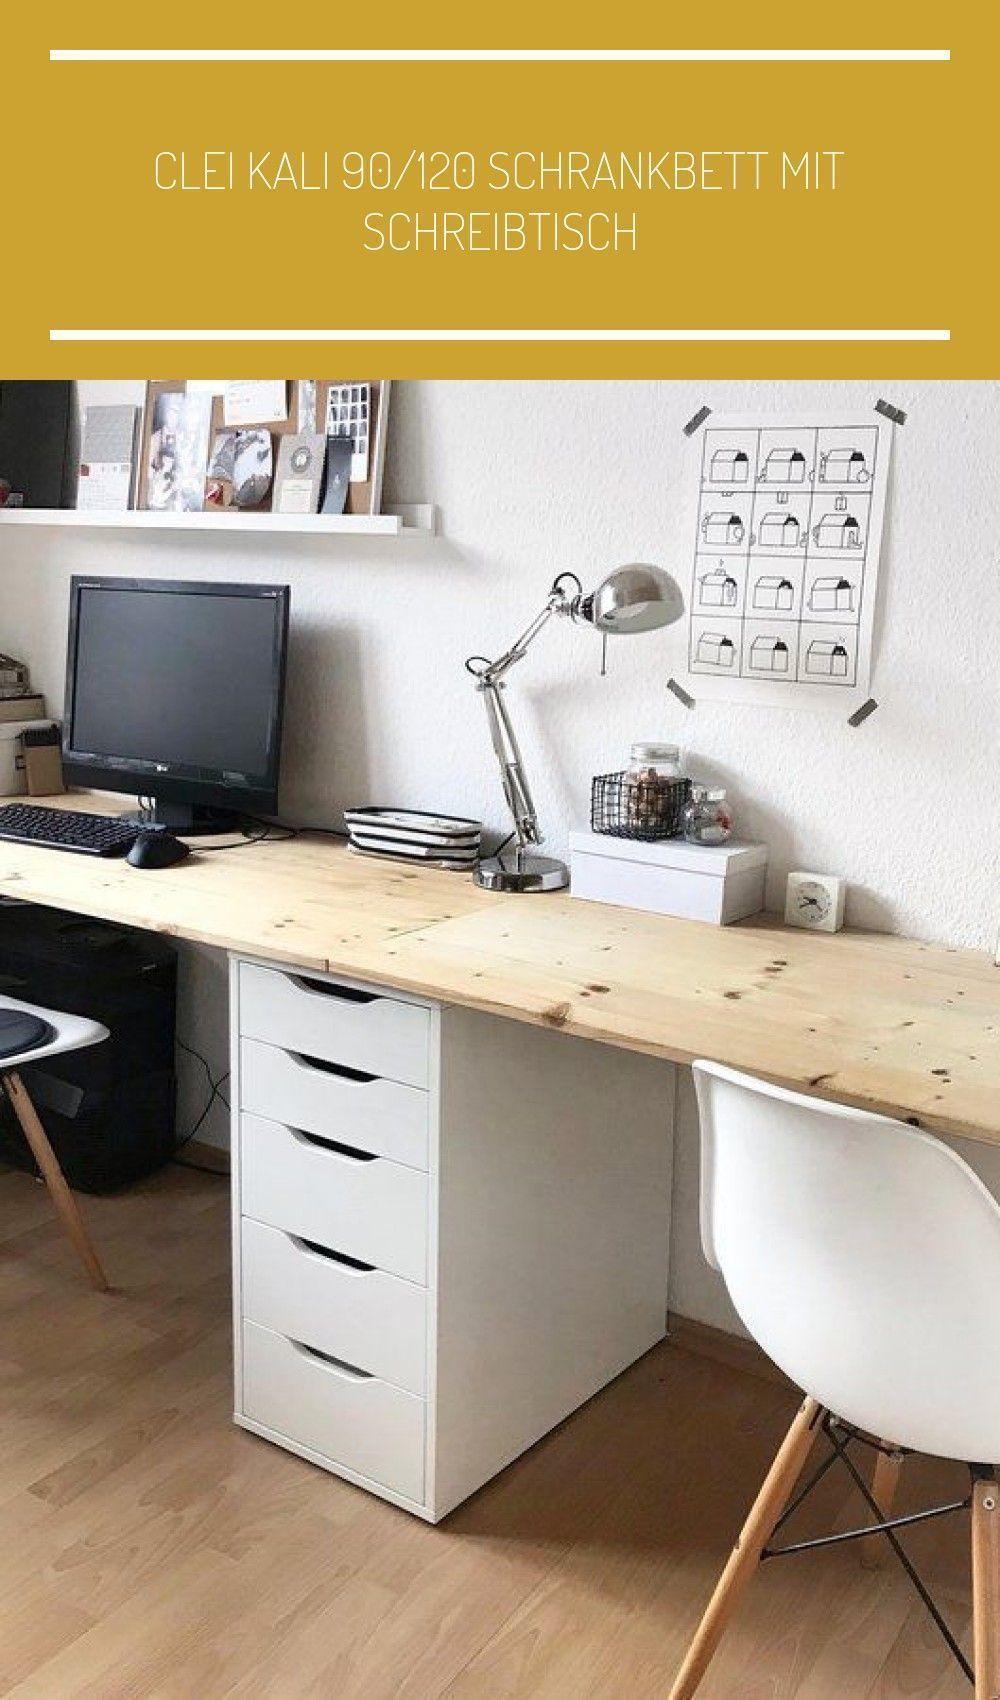 Desk Study Furniture Wood The Most Beautiful Ideas For Your Writing Schreibtisch Arbeitszim In 2020 Arbeitszimmer Einrichten Schreibtisch Arbeitszimmer